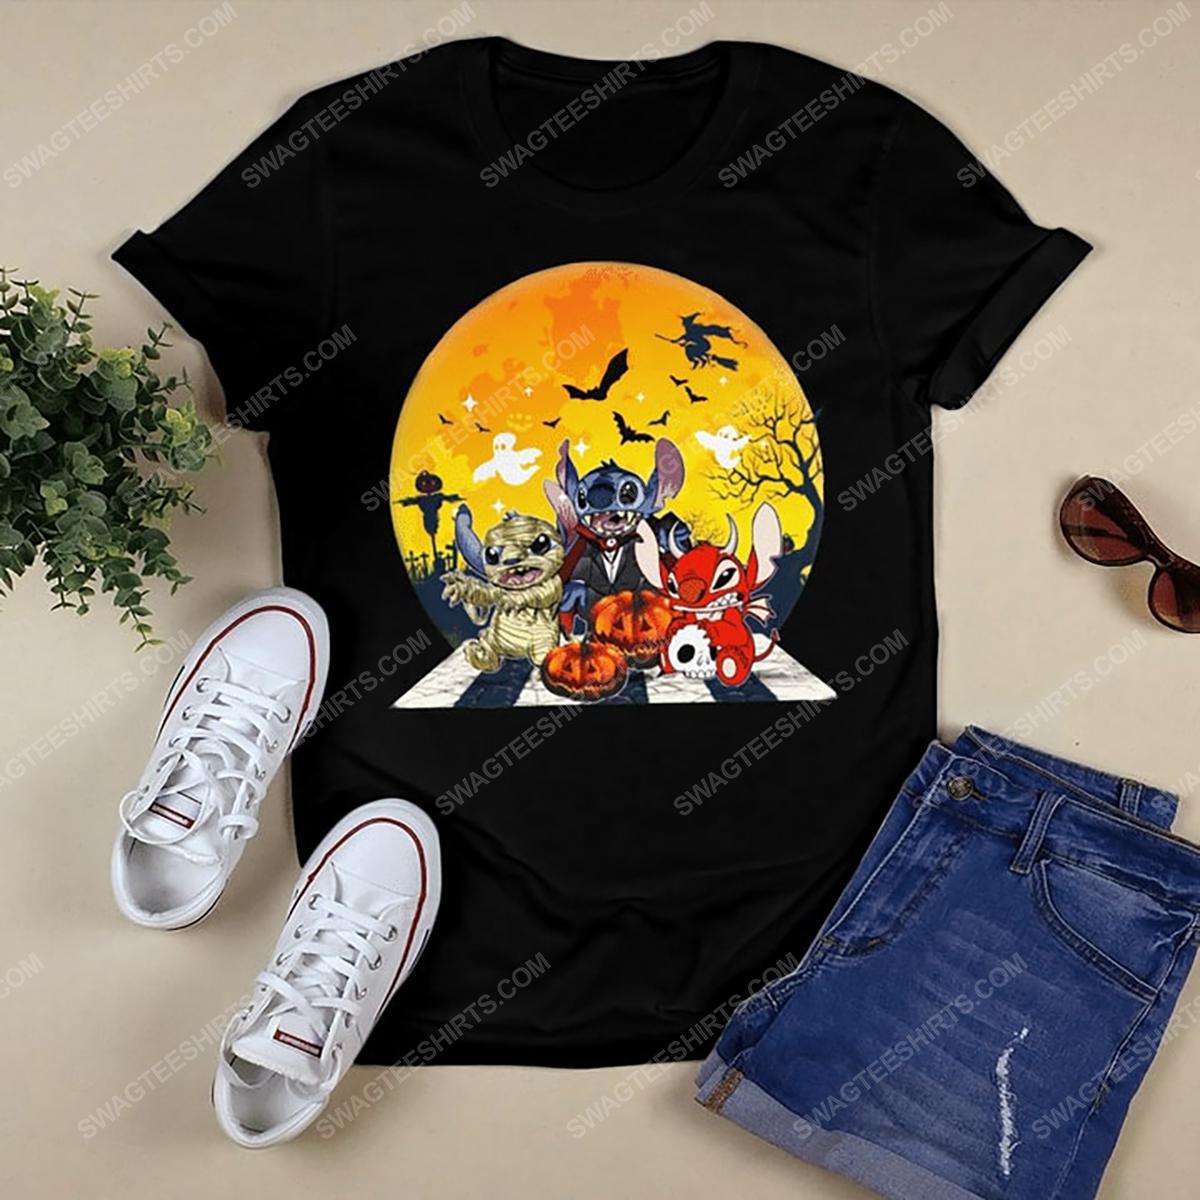 Halloween night stitch cosplay horror characters tshirt 1